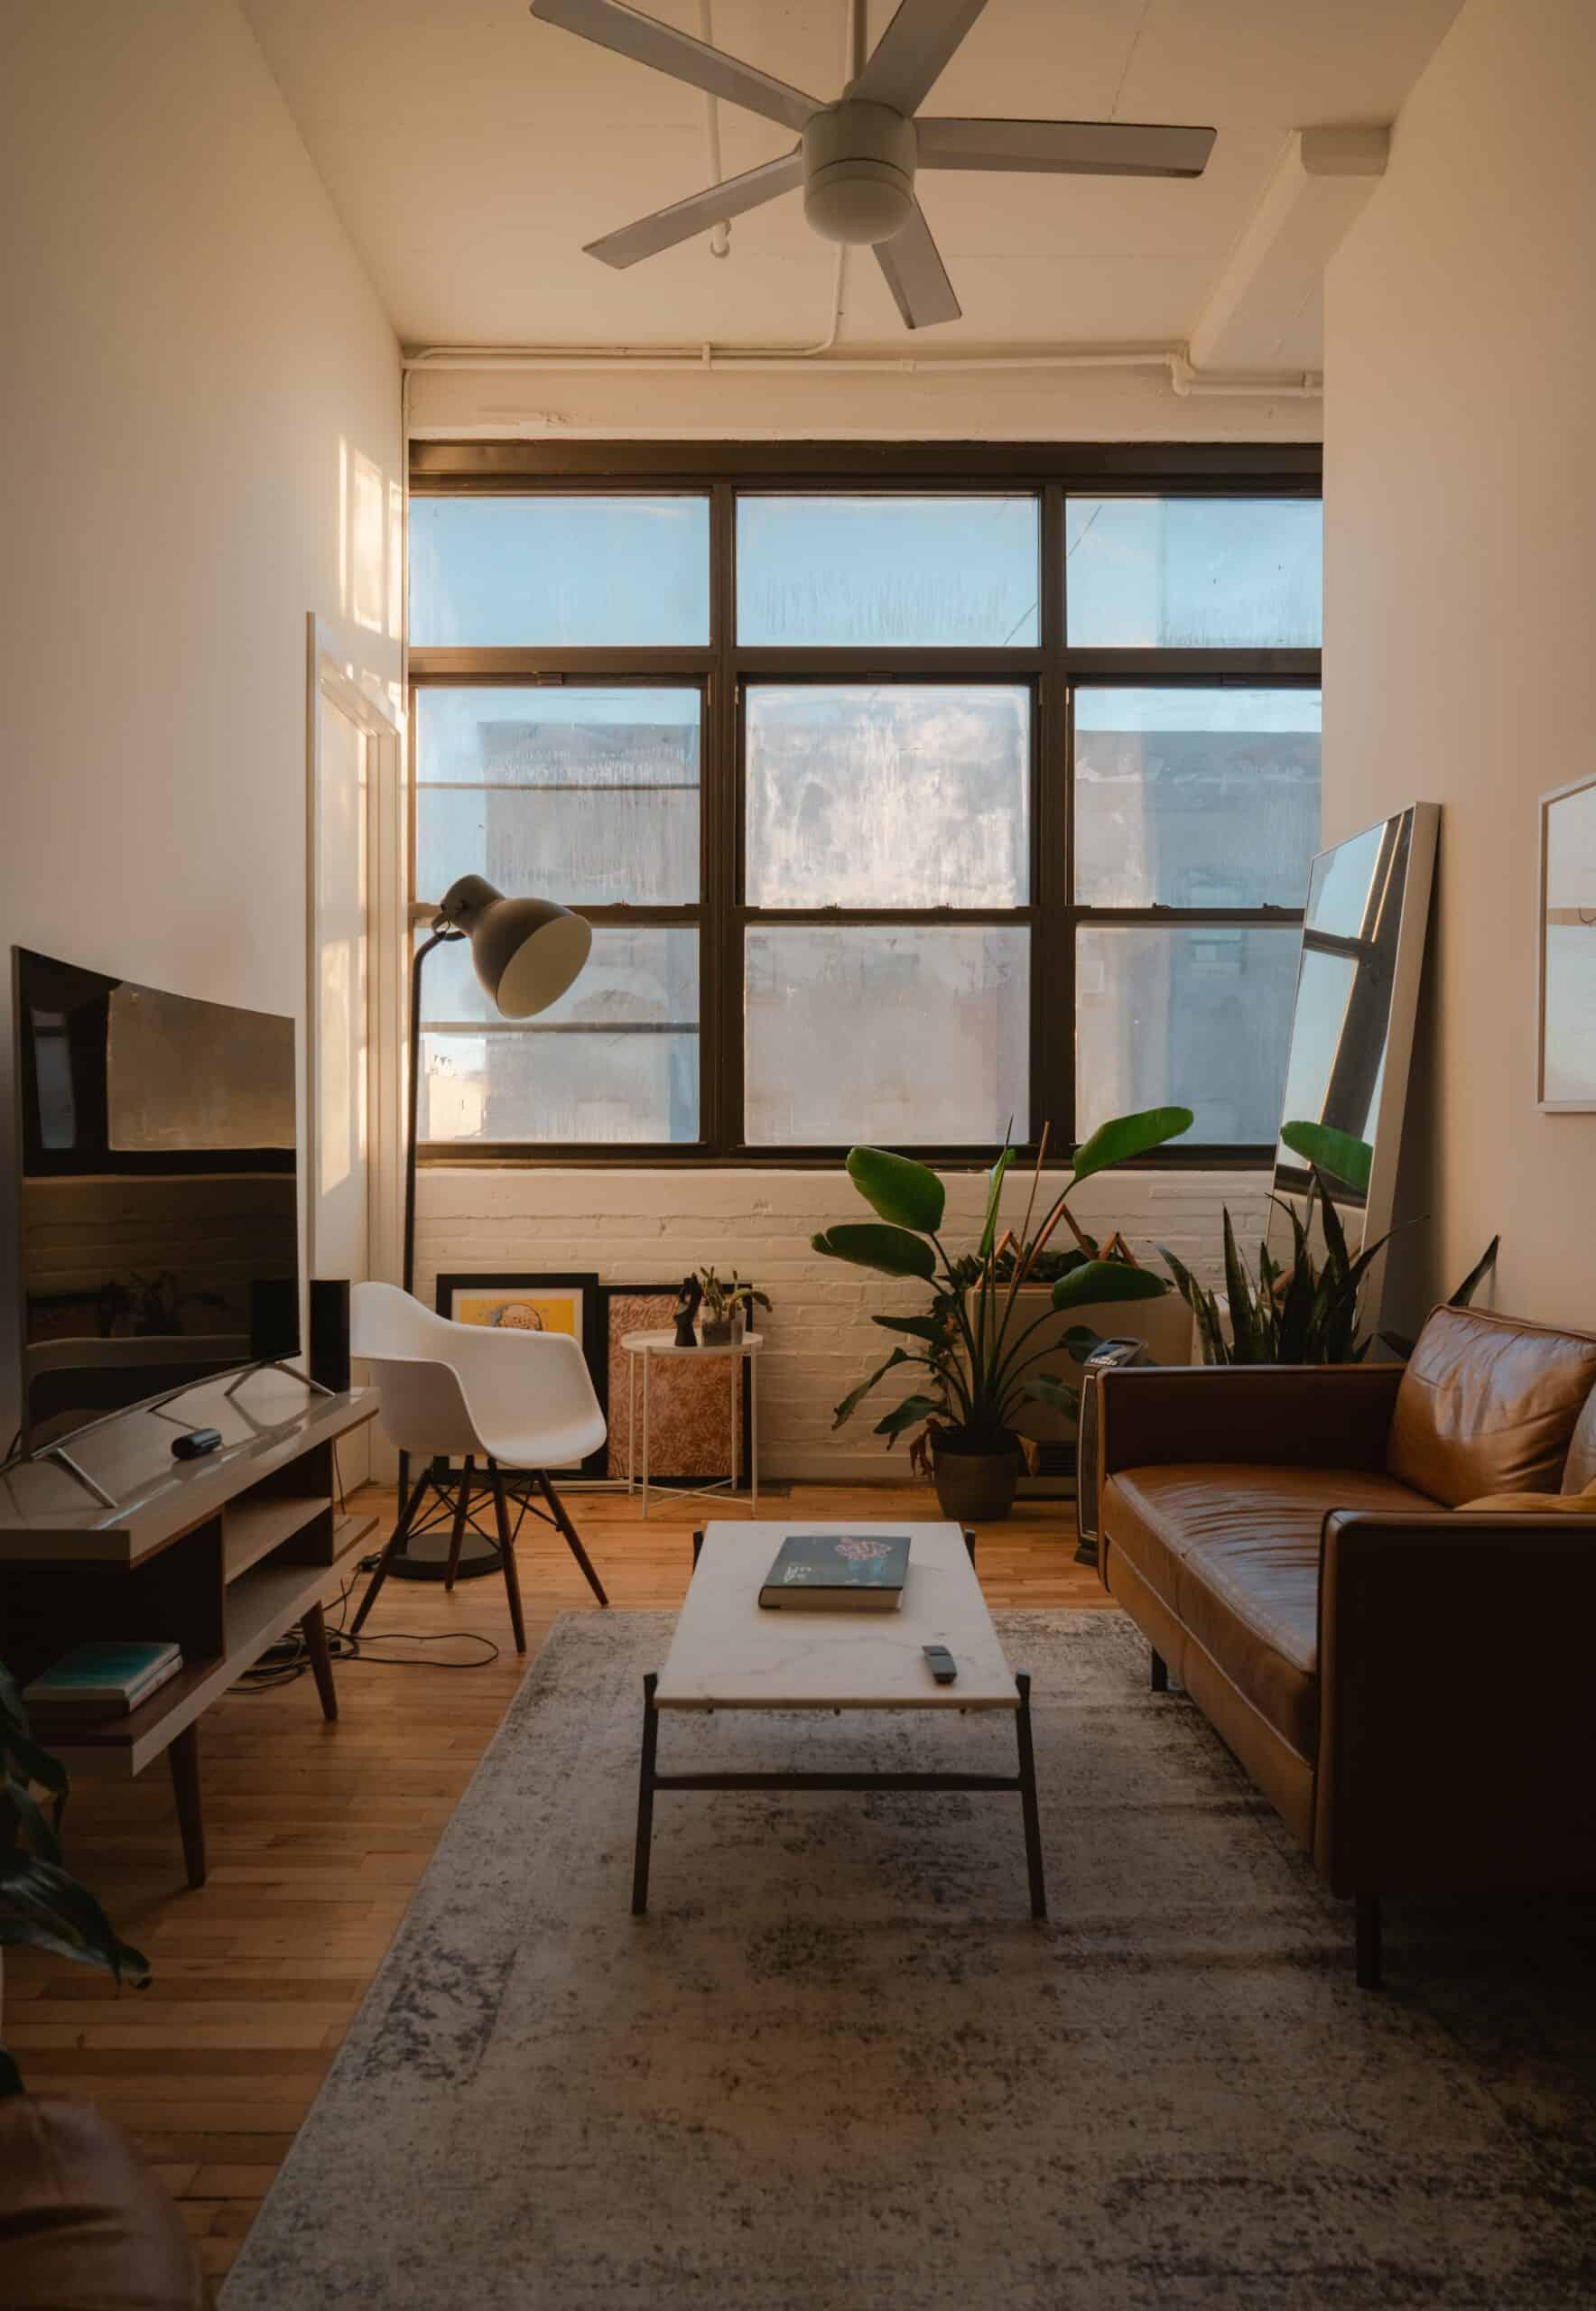 Digital Marketing for interior designers